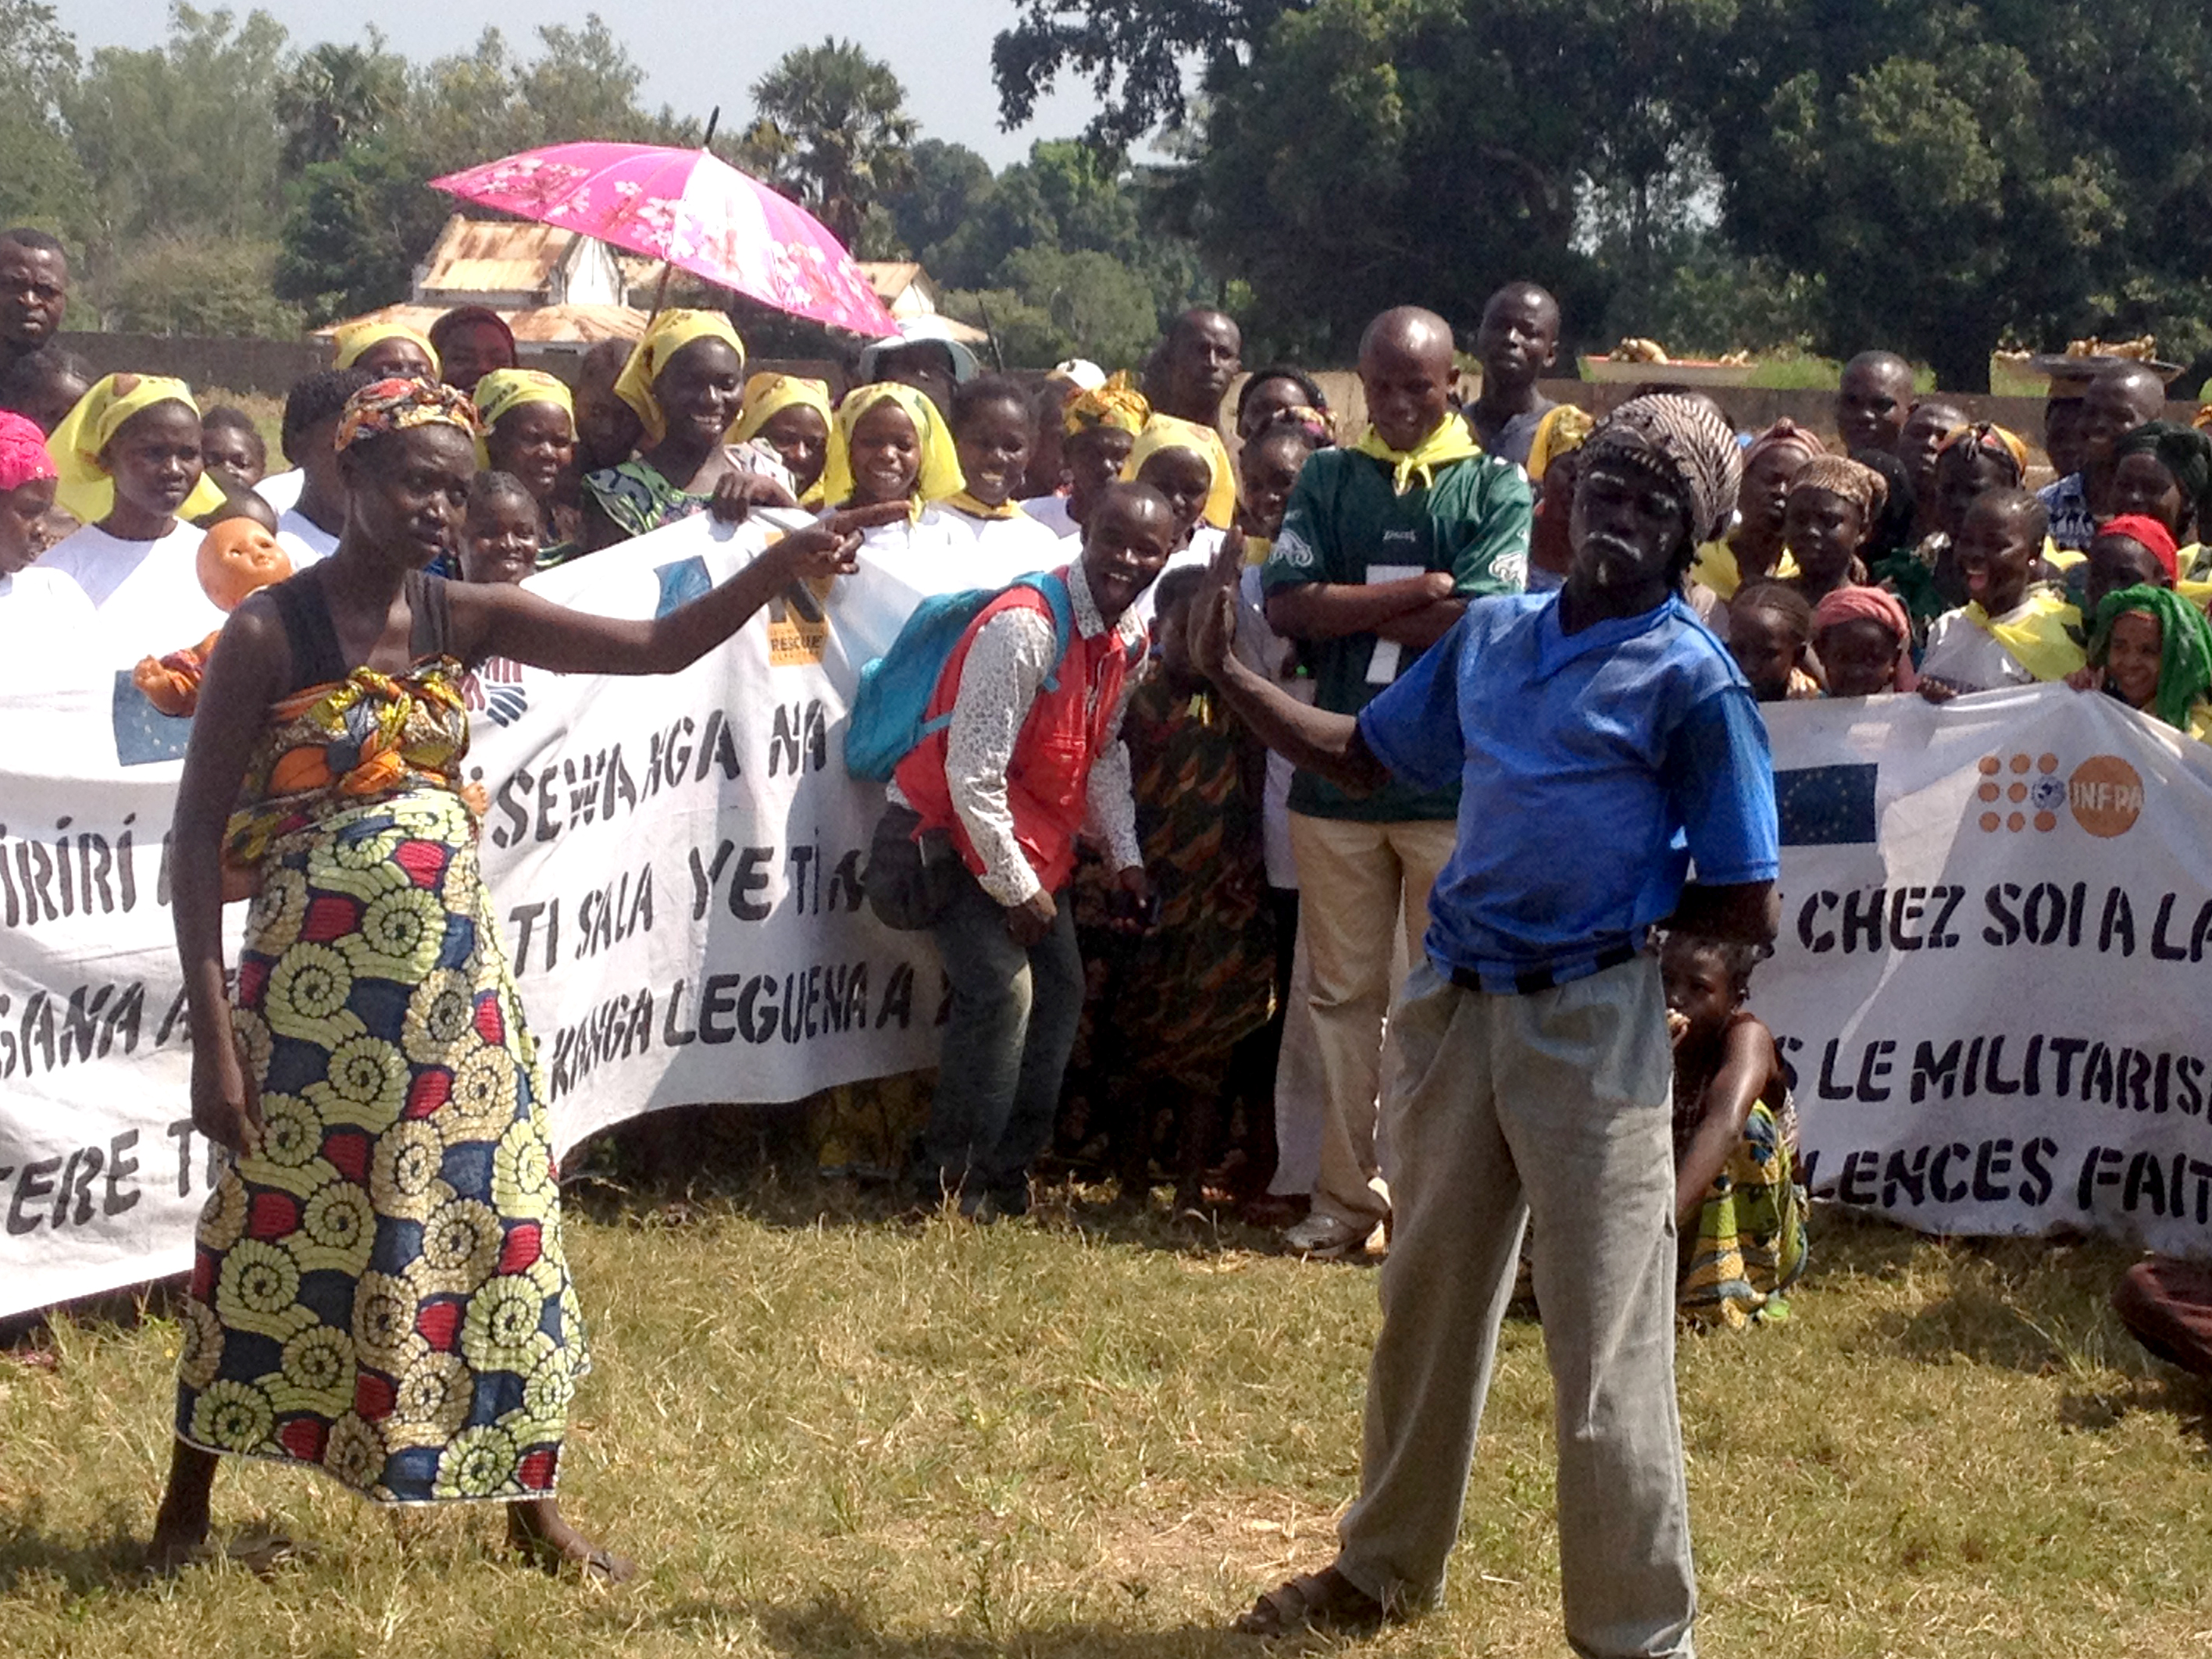 Demonstation in Central Africa Republic